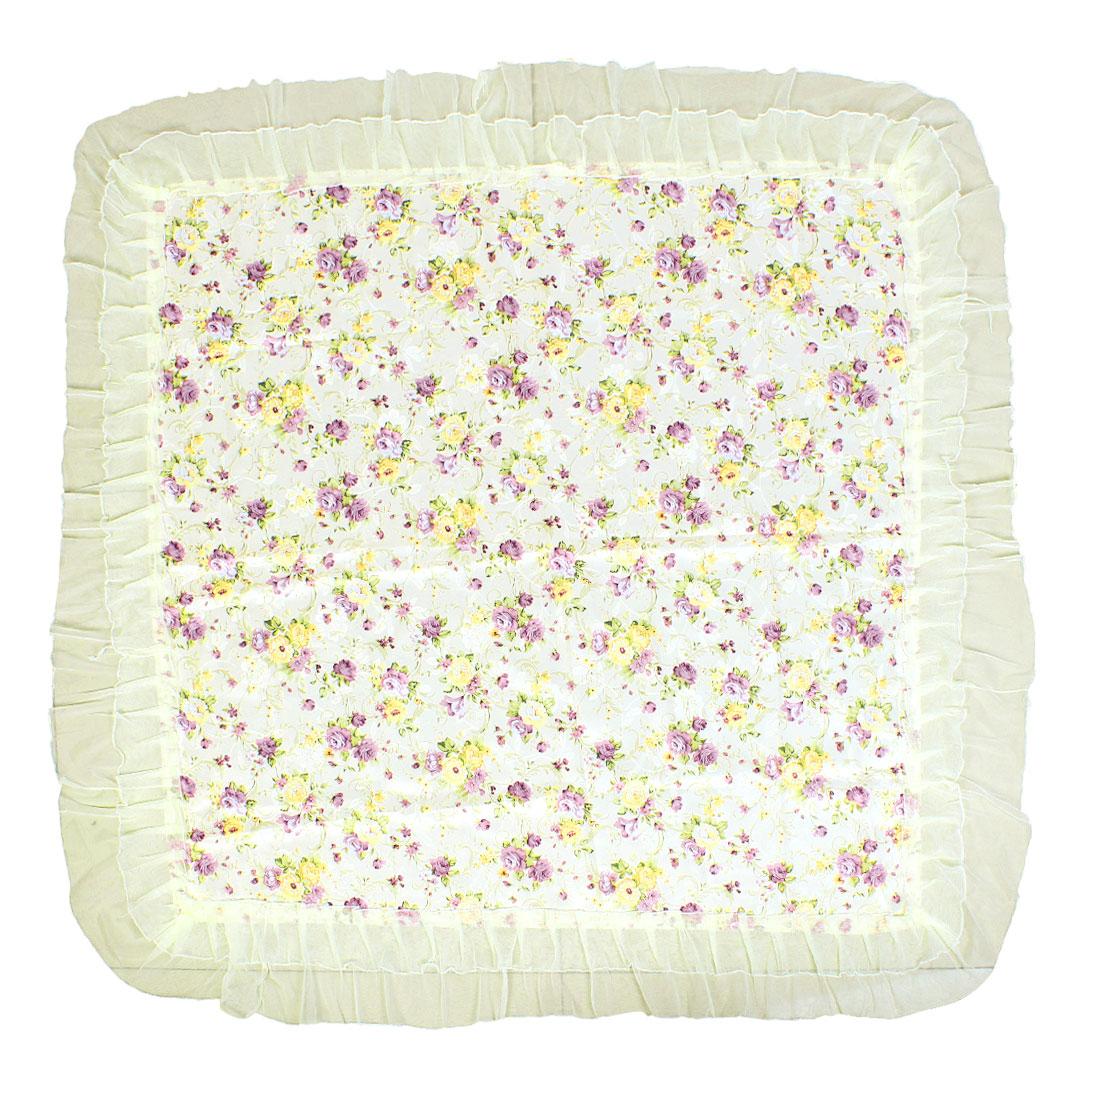 Household Floral Leave Pattern 90cm Square Tablecloth Desk Cover Purple Beige